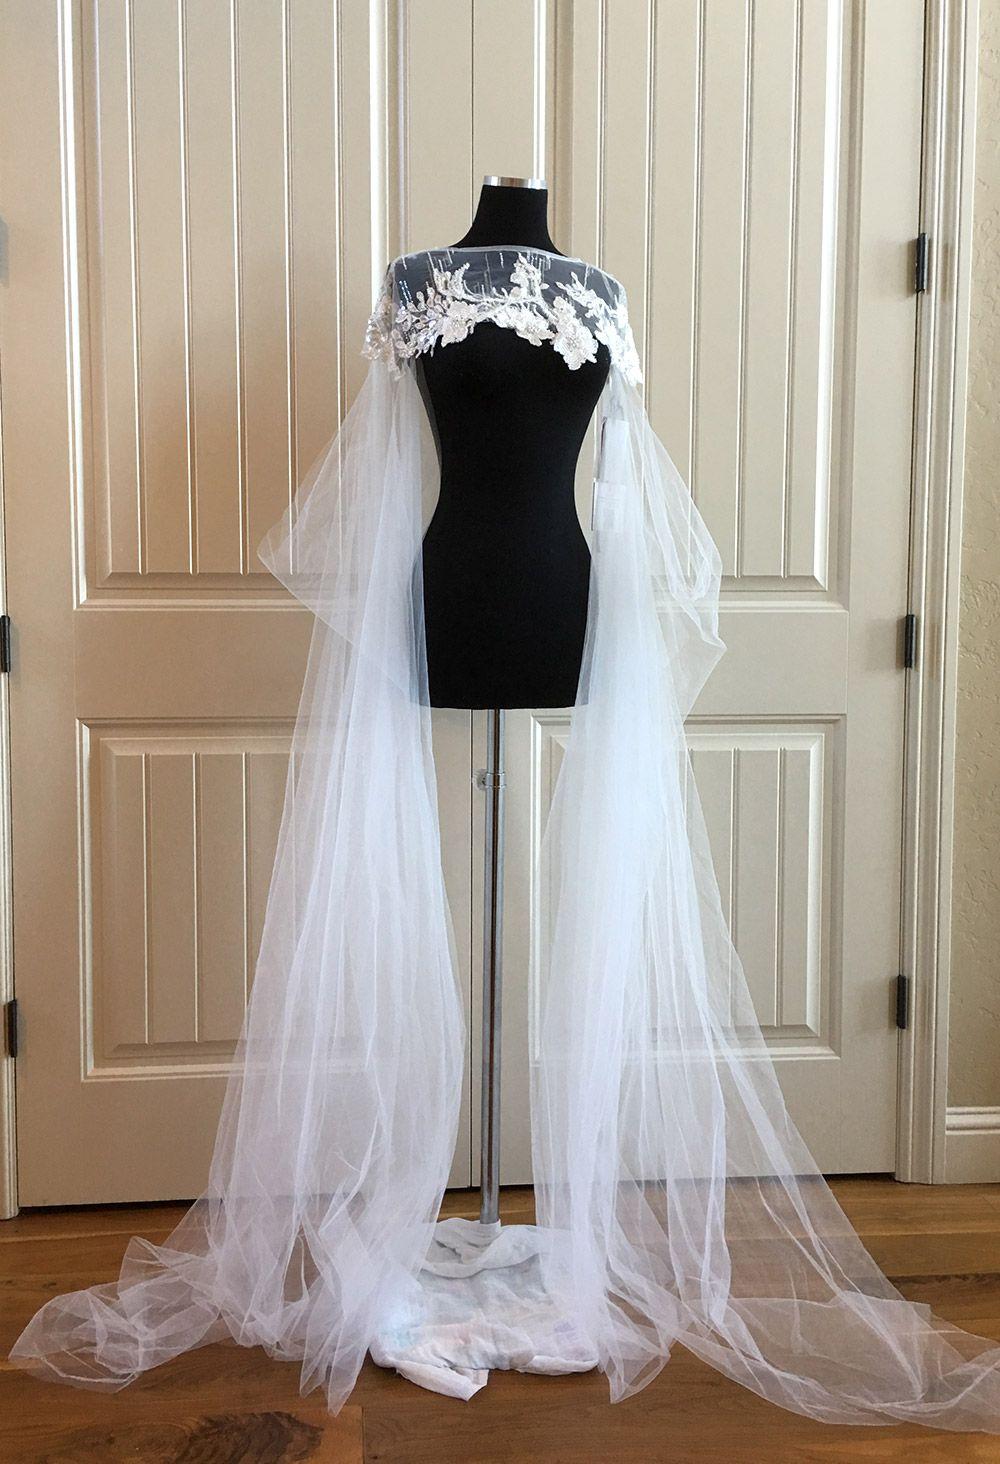 Milla Nova Cape Elle (With images) Wedding dresses